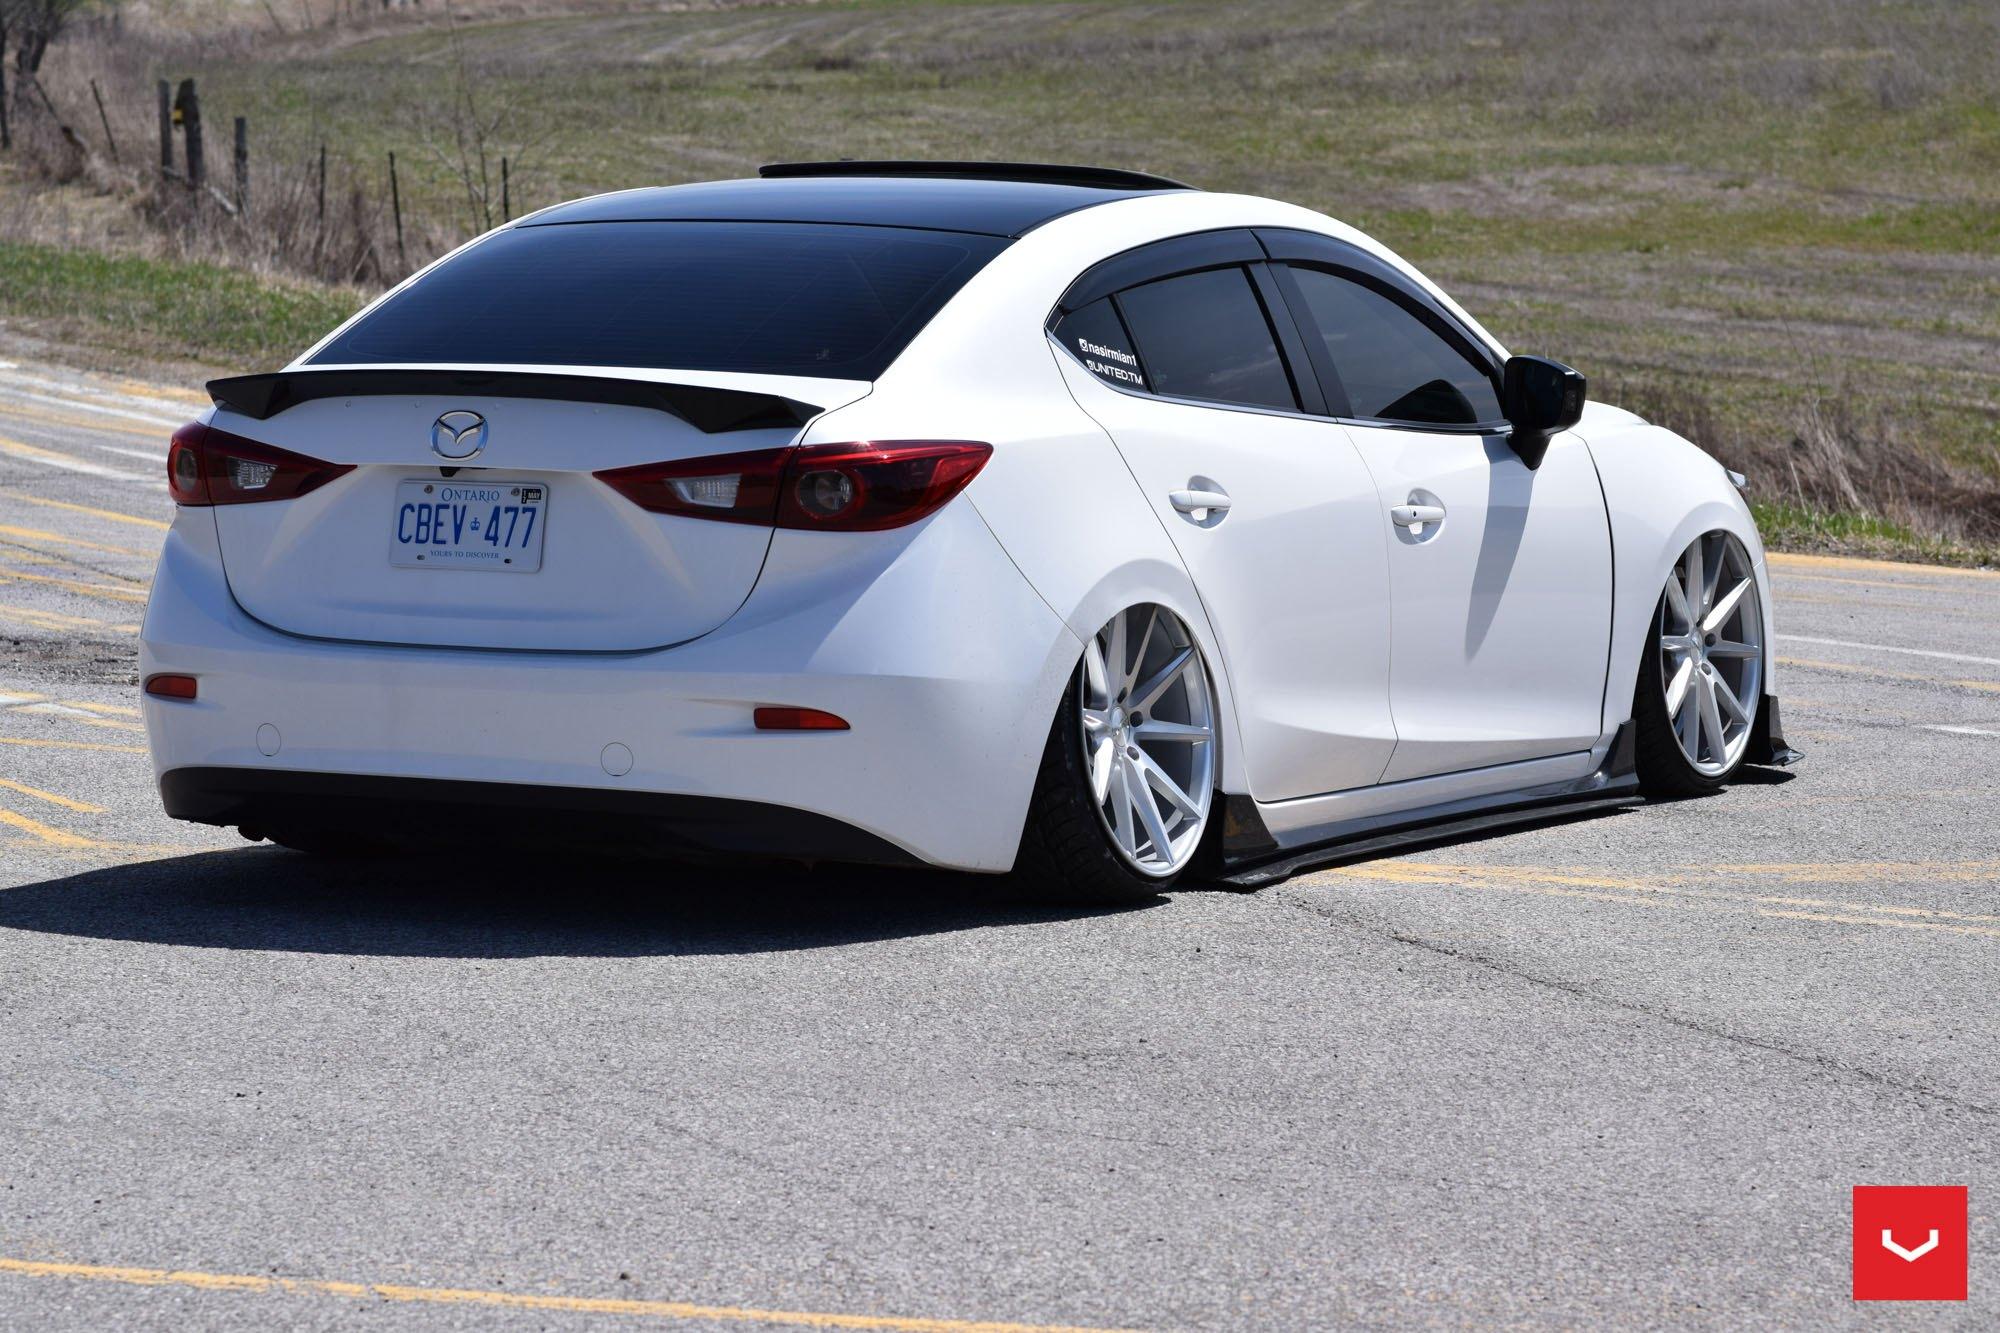 cars black special s spoiler sport mazda edition top speed